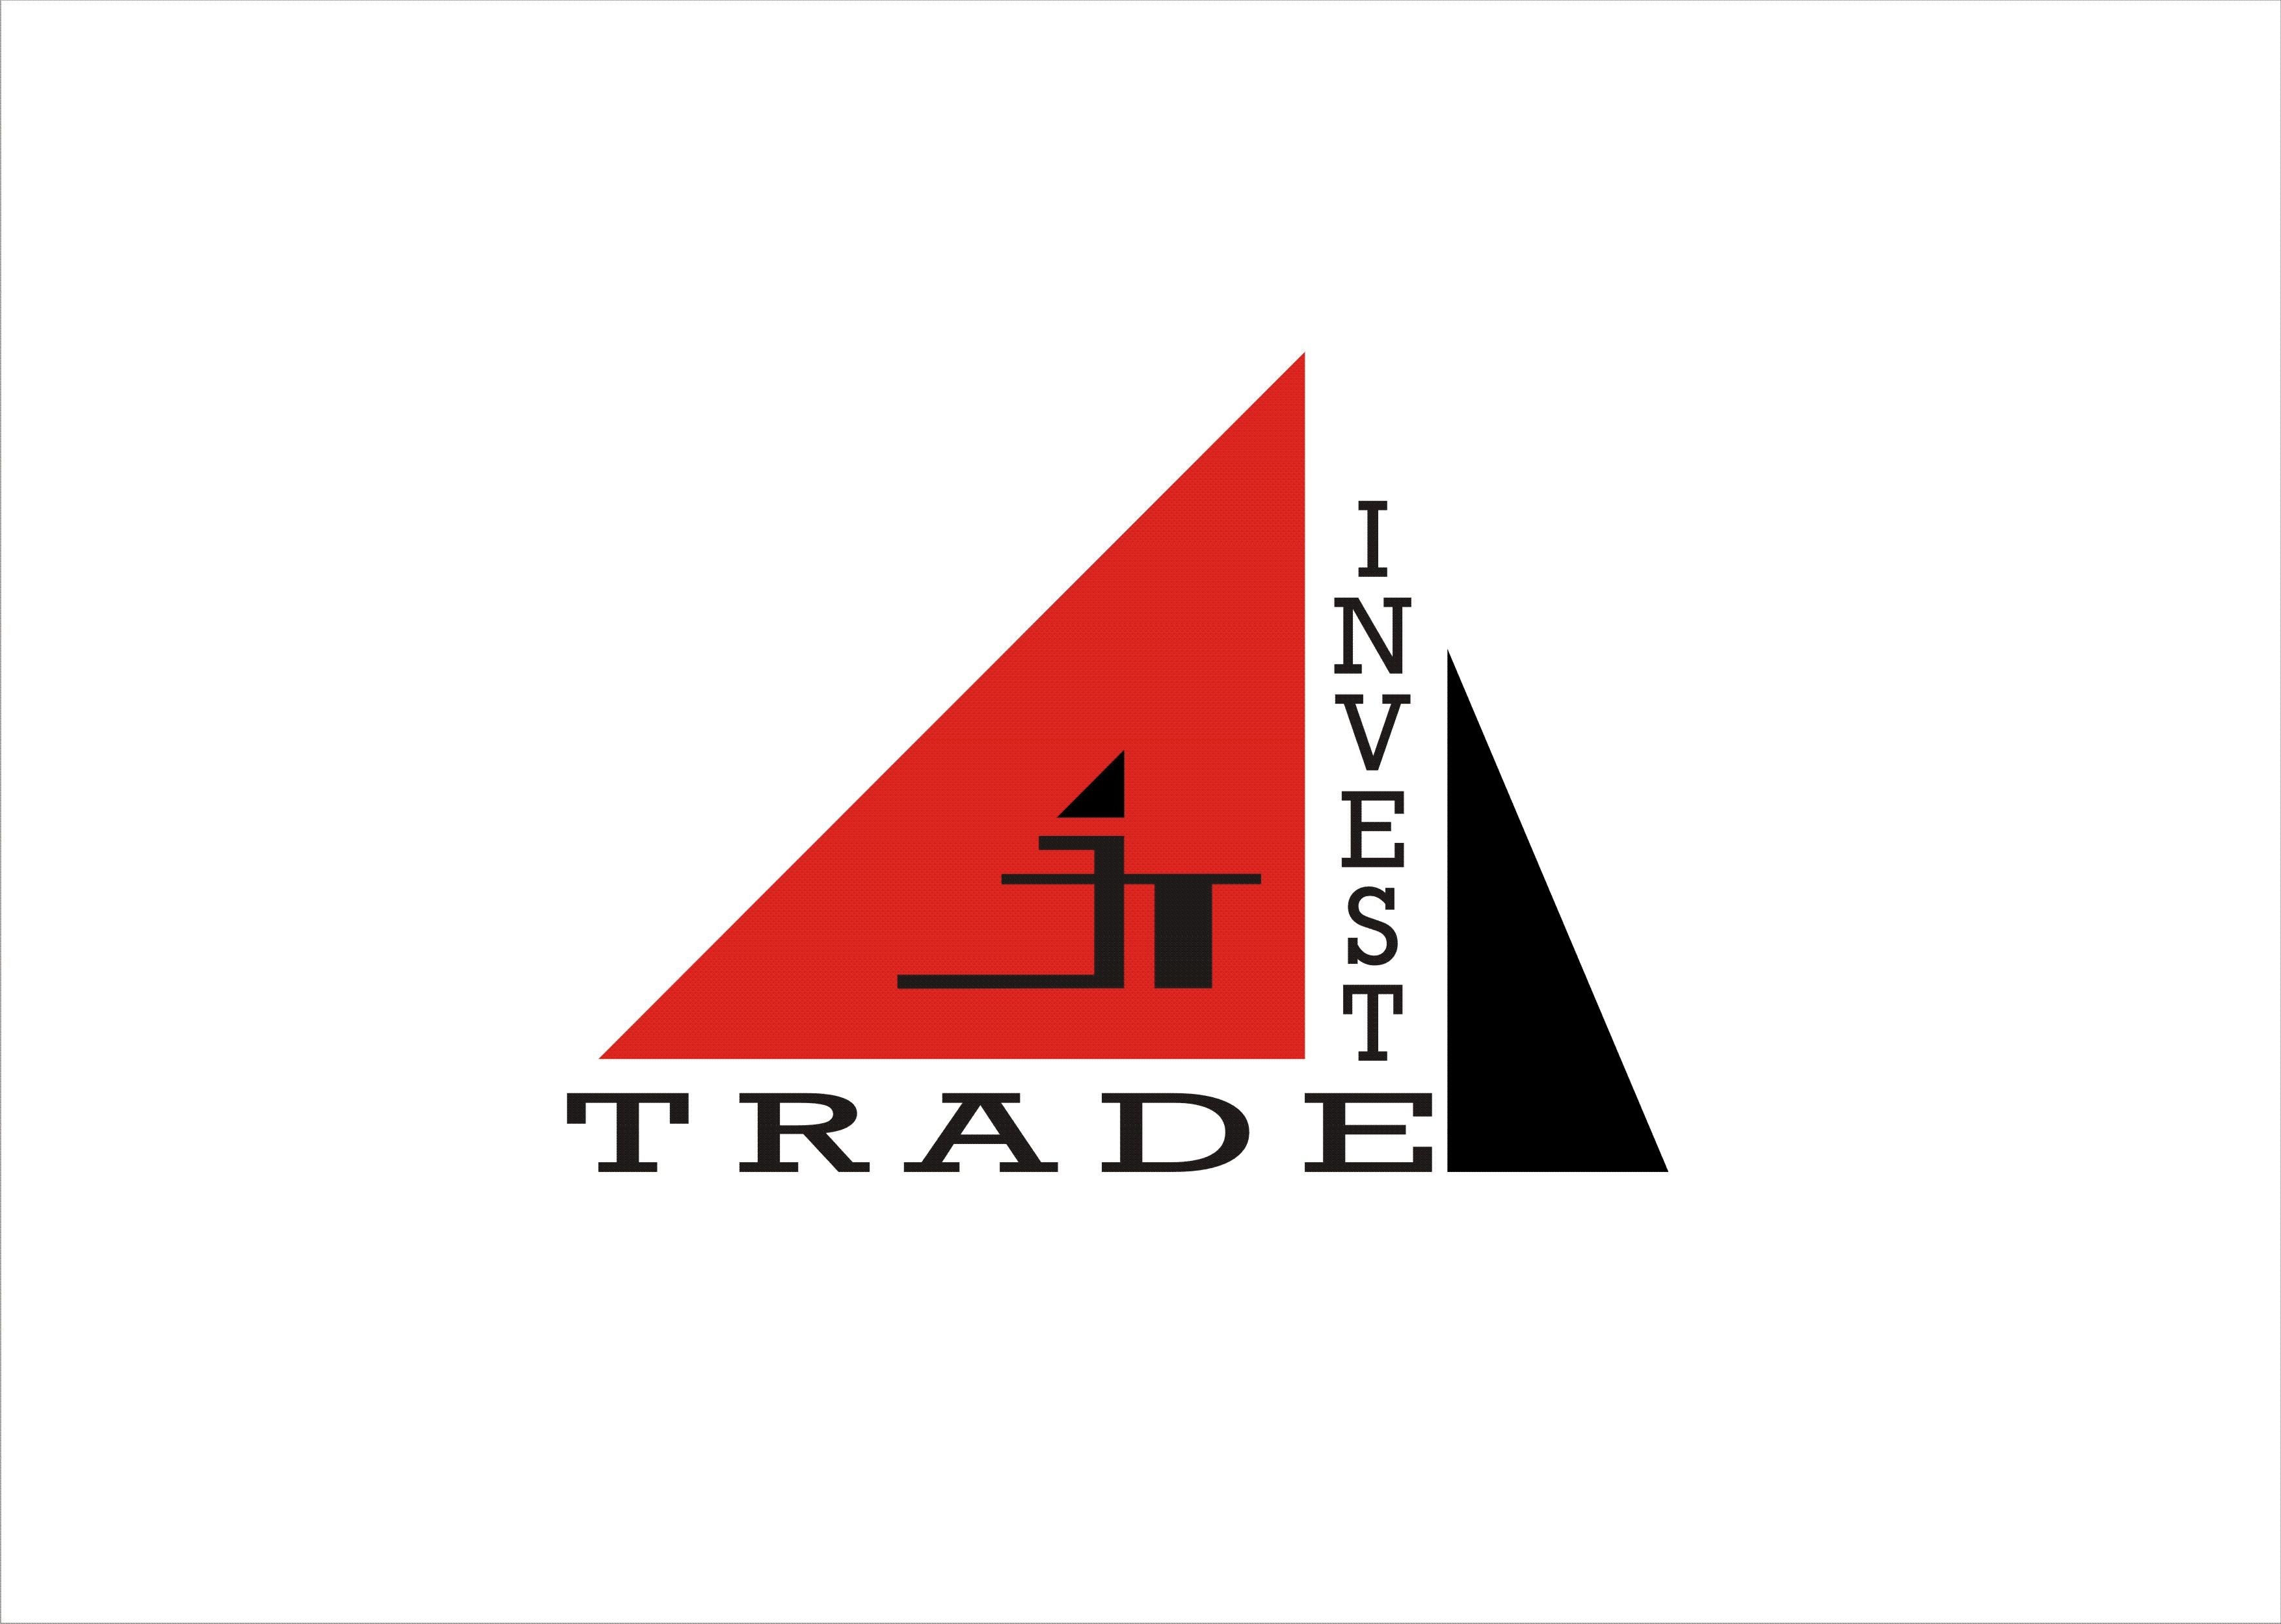 Разработка логотипа для компании Invest trade фото f_743512403cc5031b.jpg